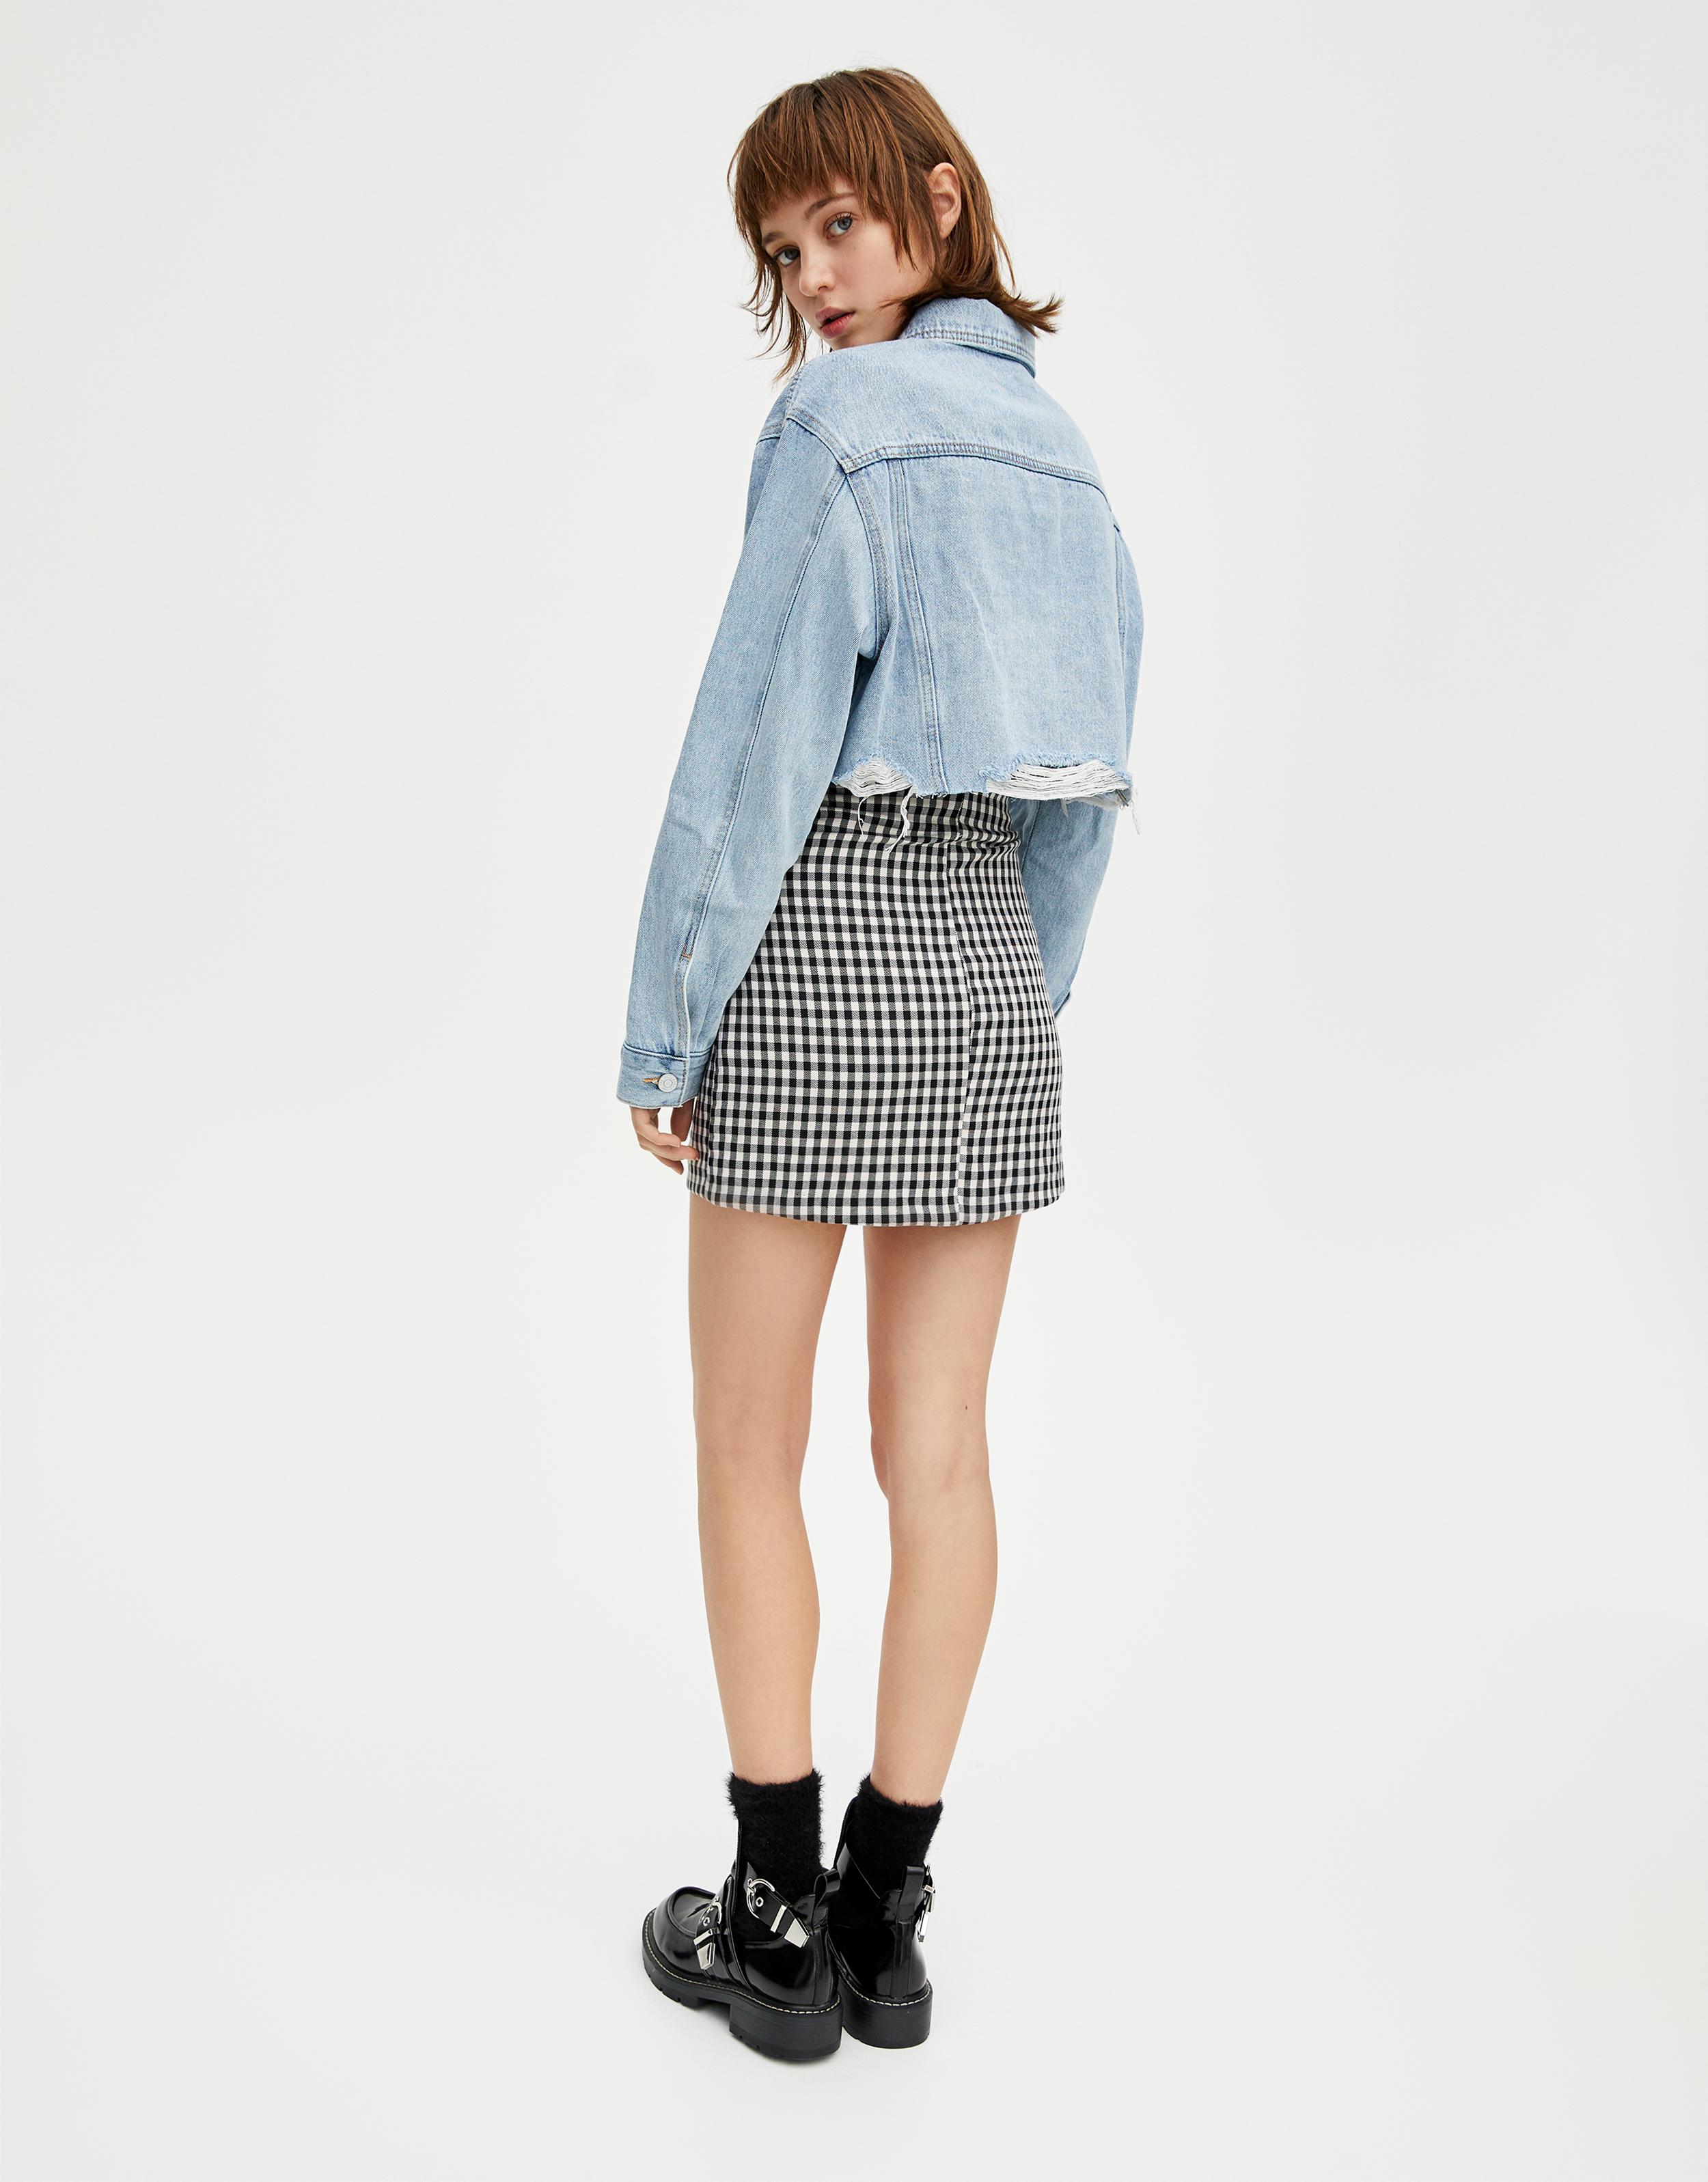 0192b8b29cb Minifaldas de mujer - Primavera Verano 2019